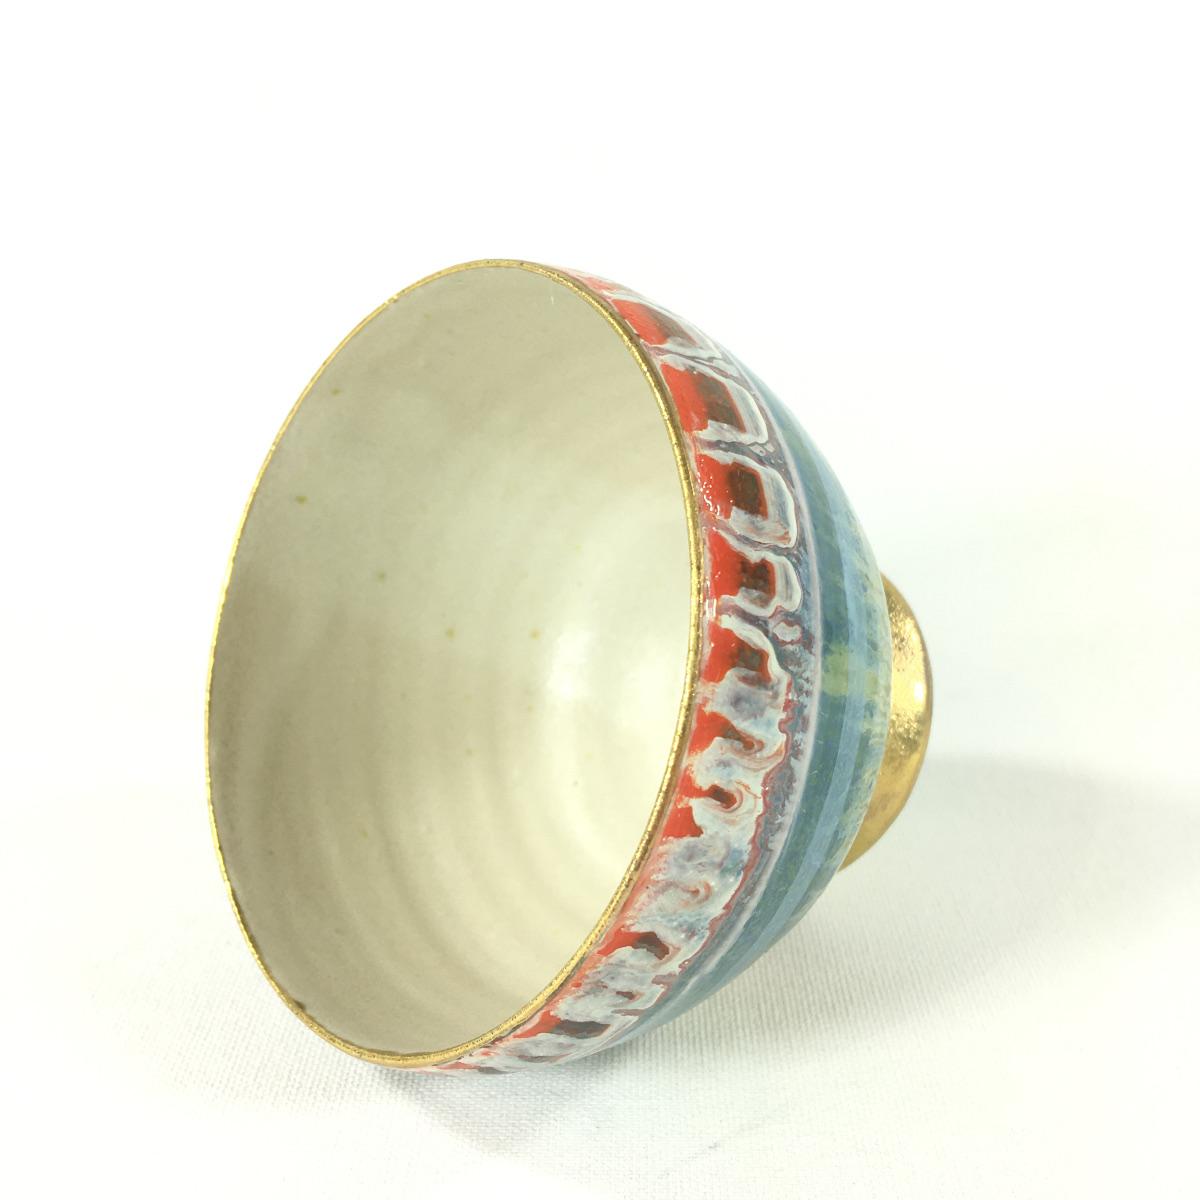 Keramikbowl Abstrakt (türkis) Bild 2